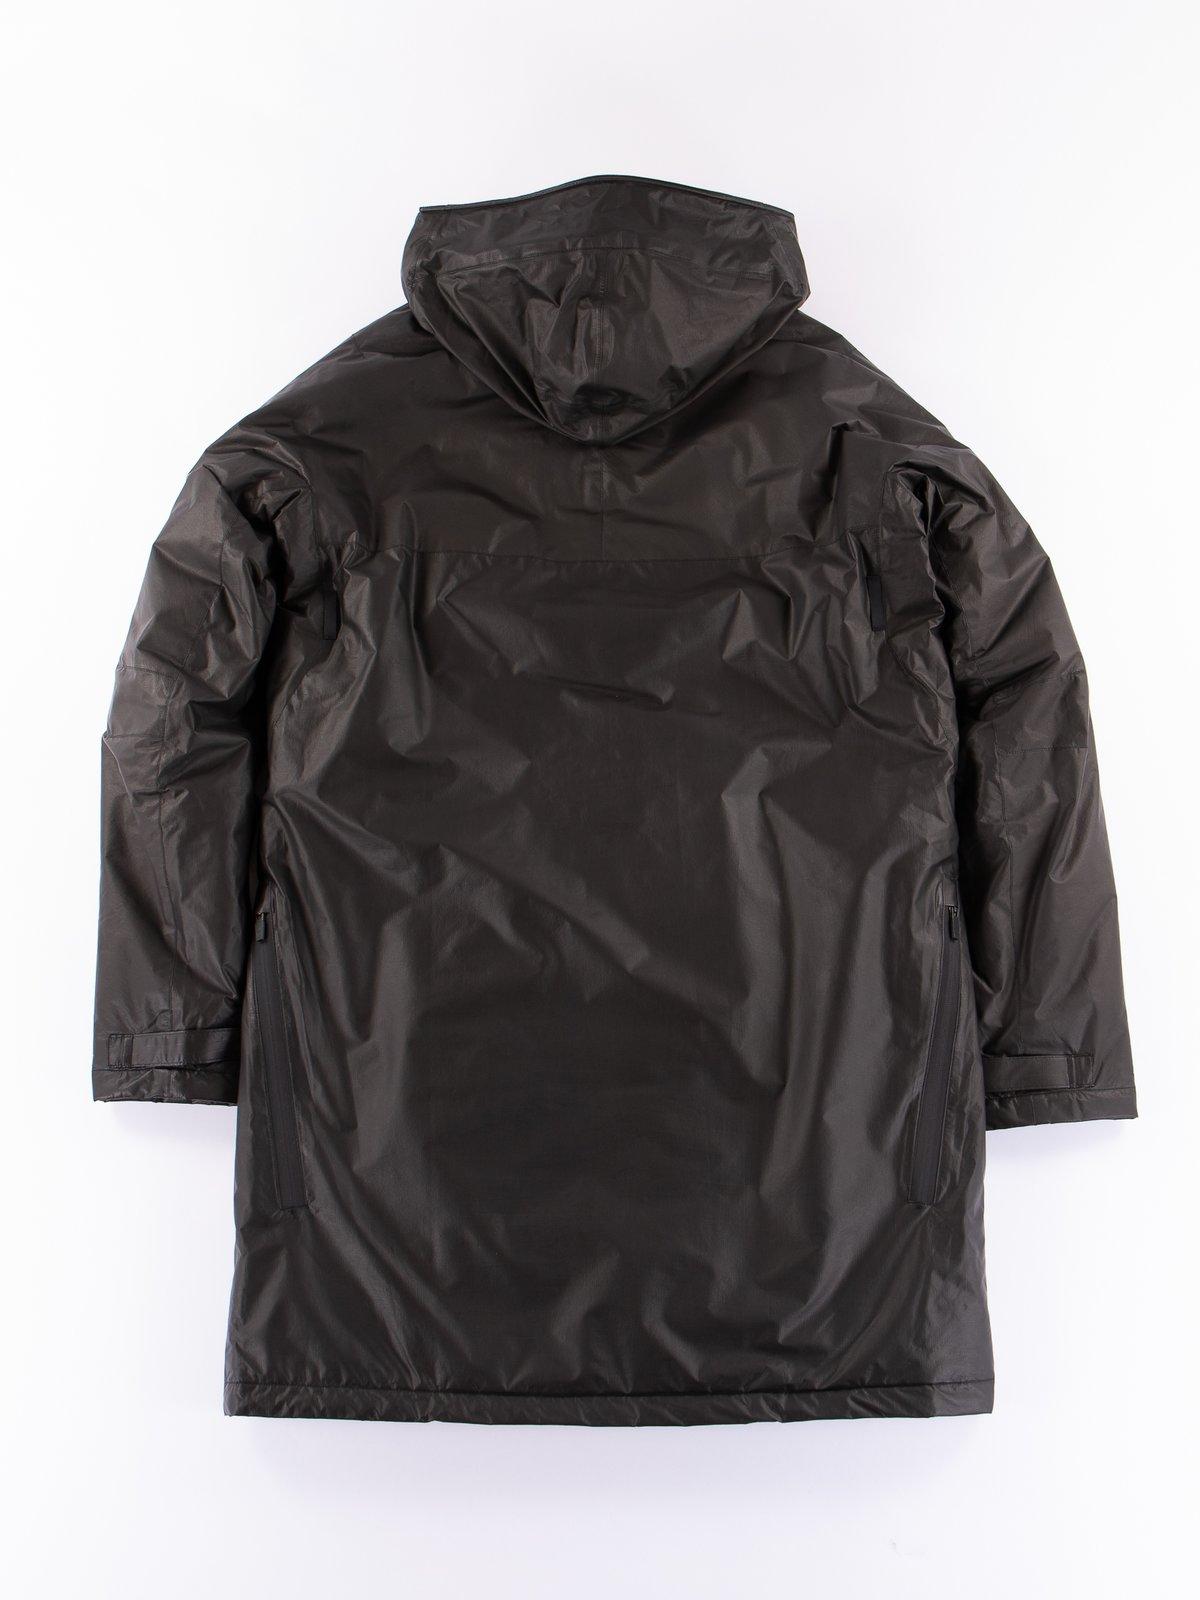 J46–FO 2L Gore–Tex Infinium Climashield Jacket - Image 2